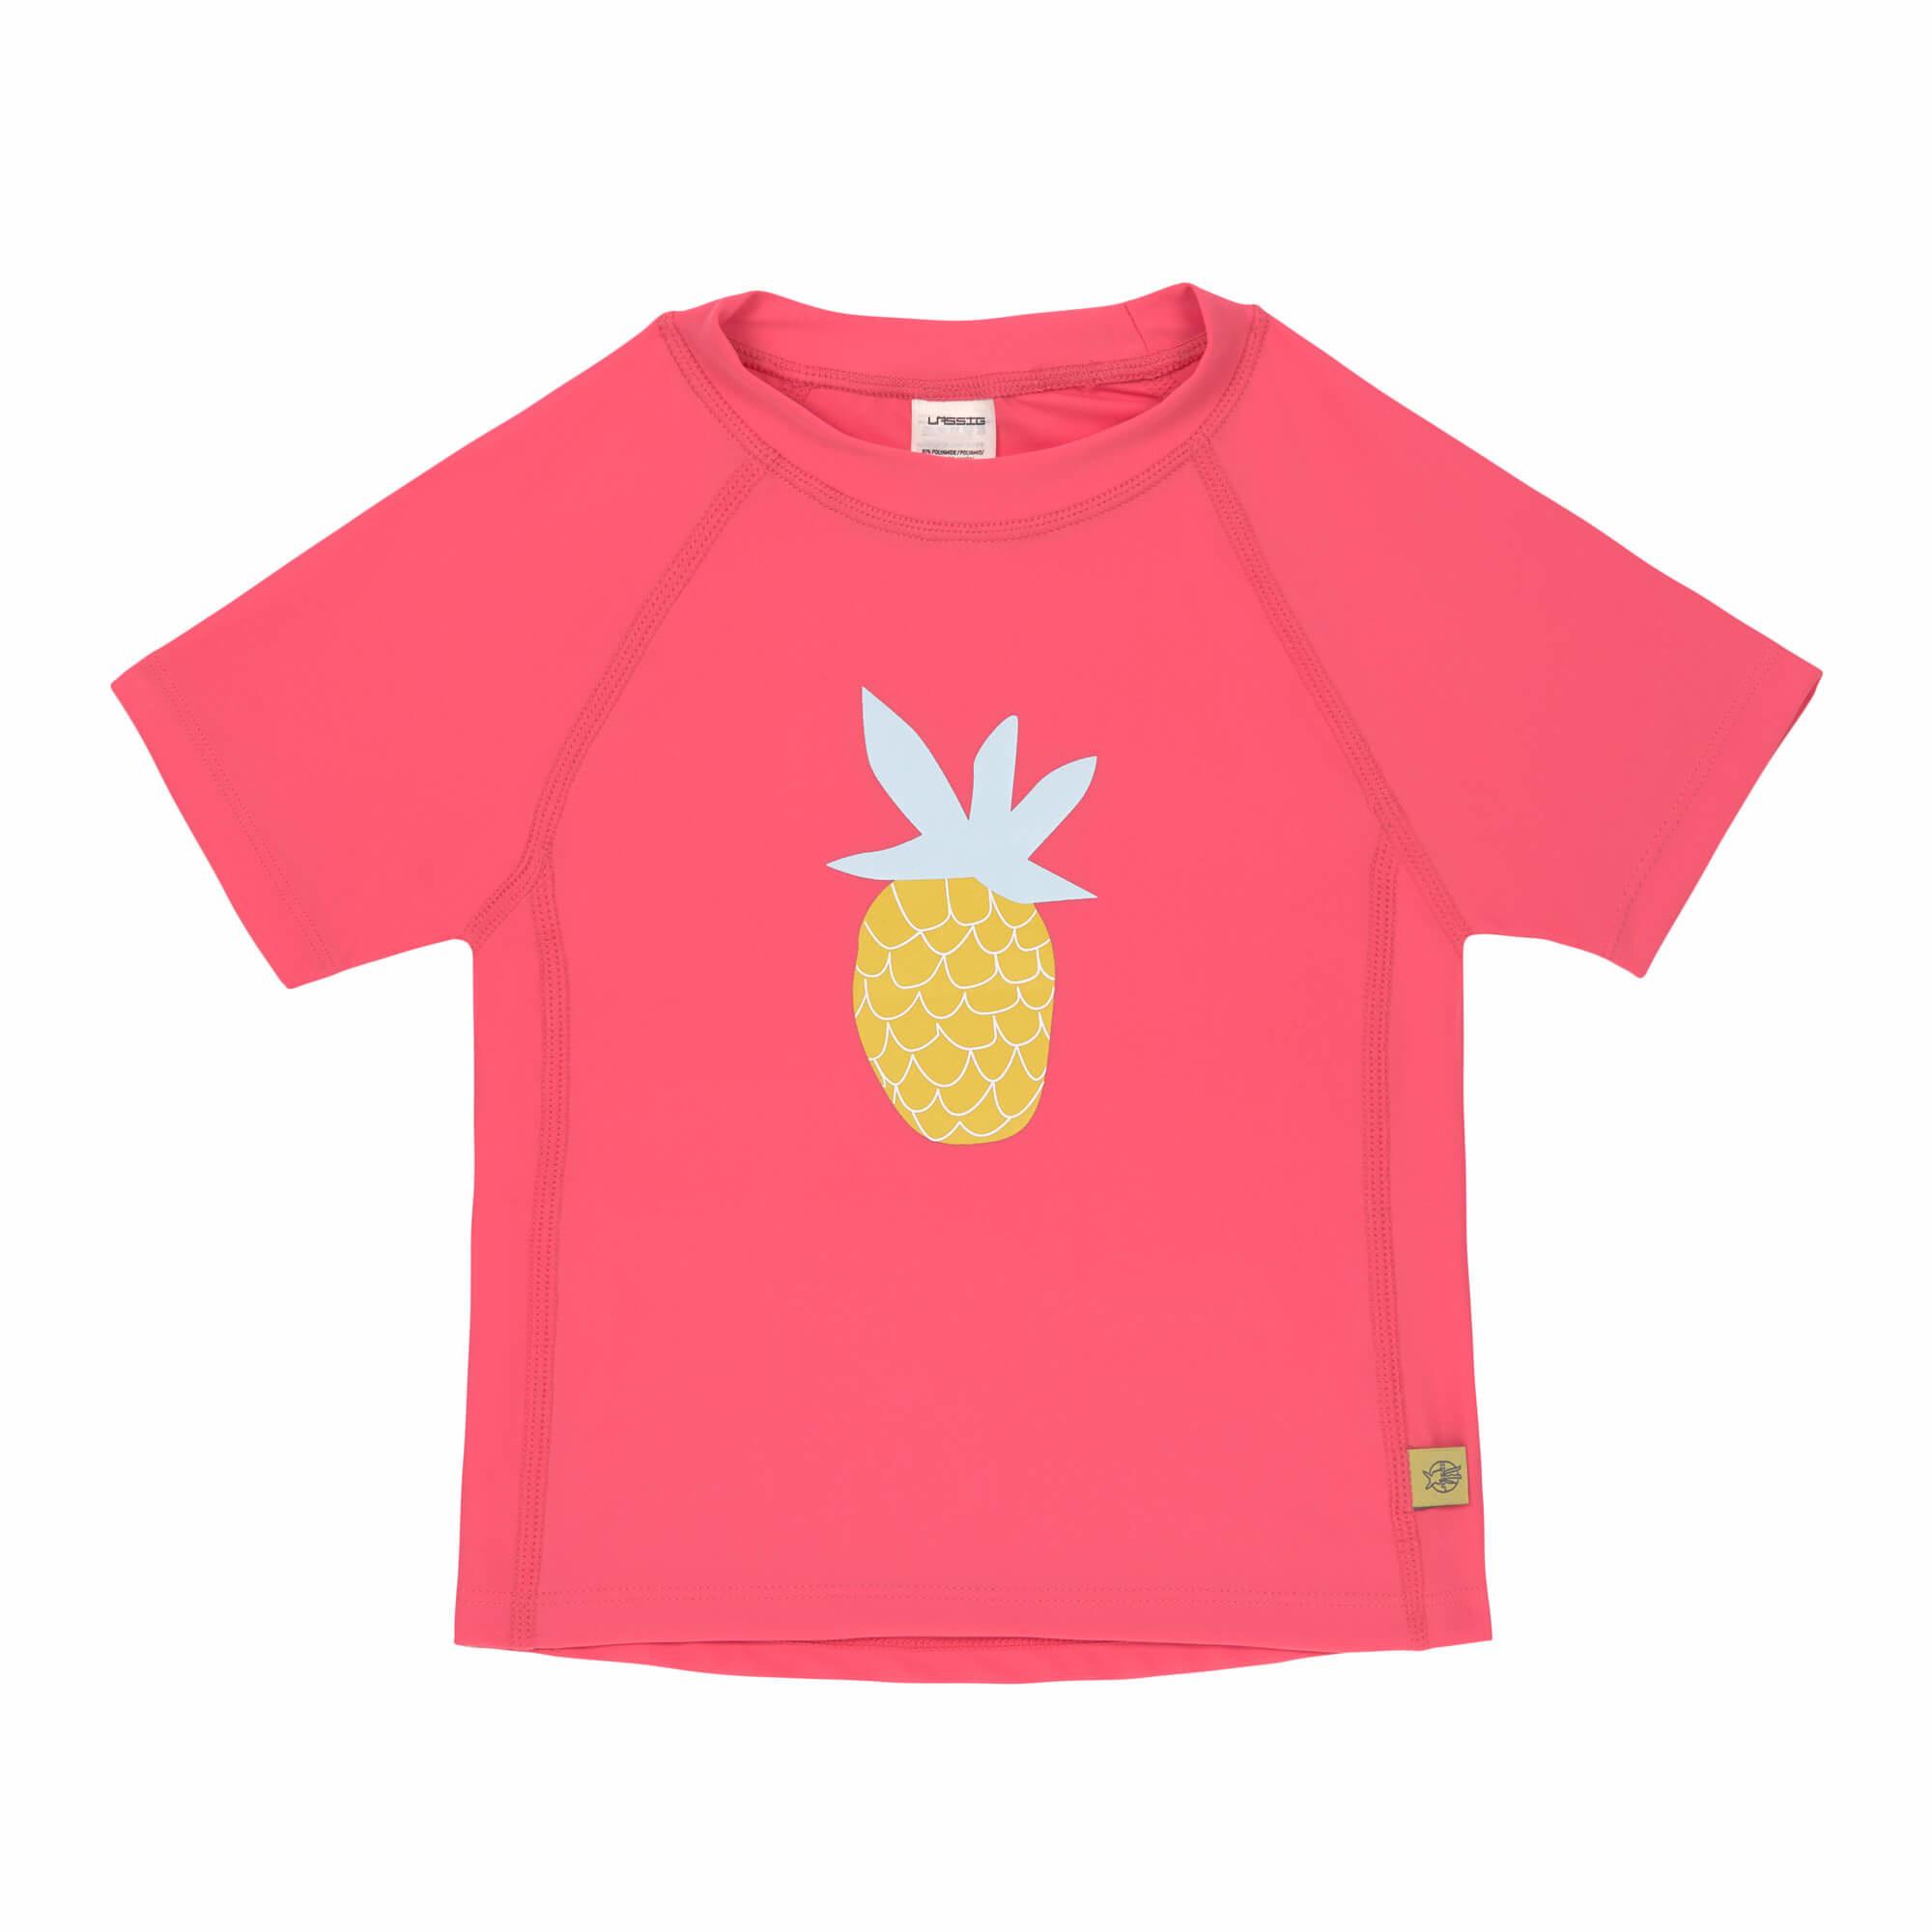 Lässig Lässig Splash & Fun Korte mouw Rashguard / zwemshirt - pineapple 6 maanden